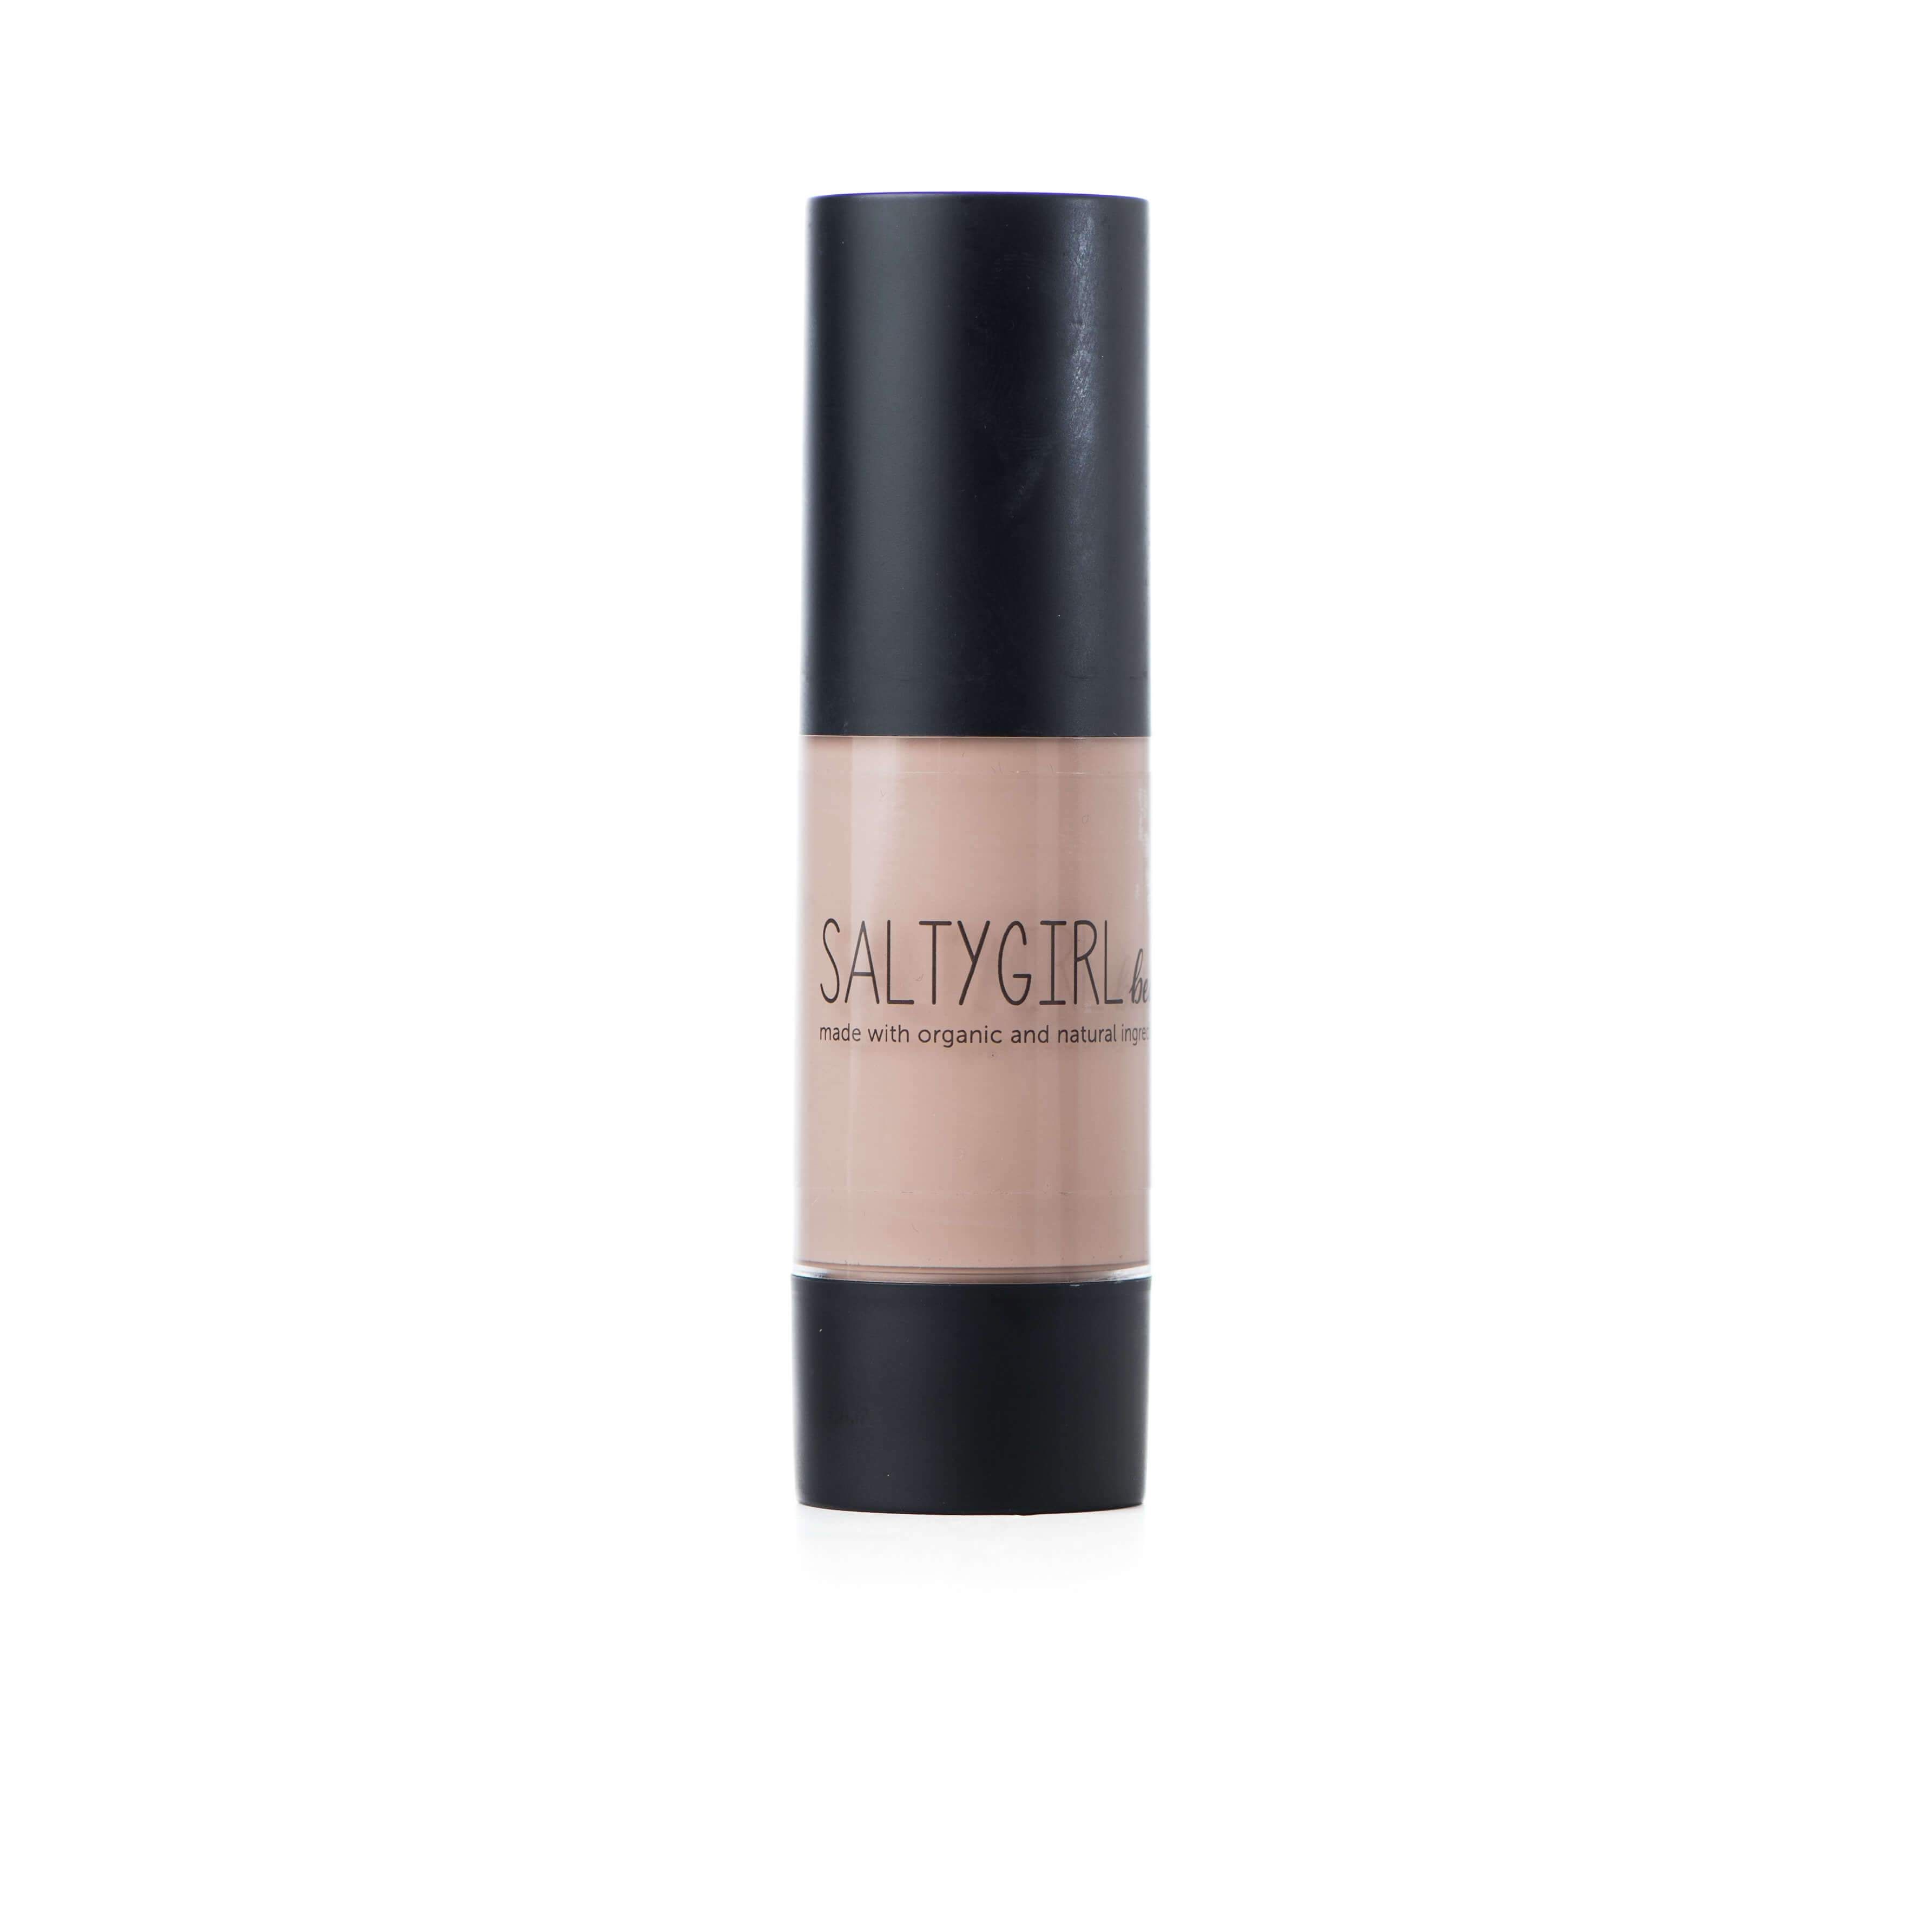 Salty Girl Beauty Foundation Natural makeup brands